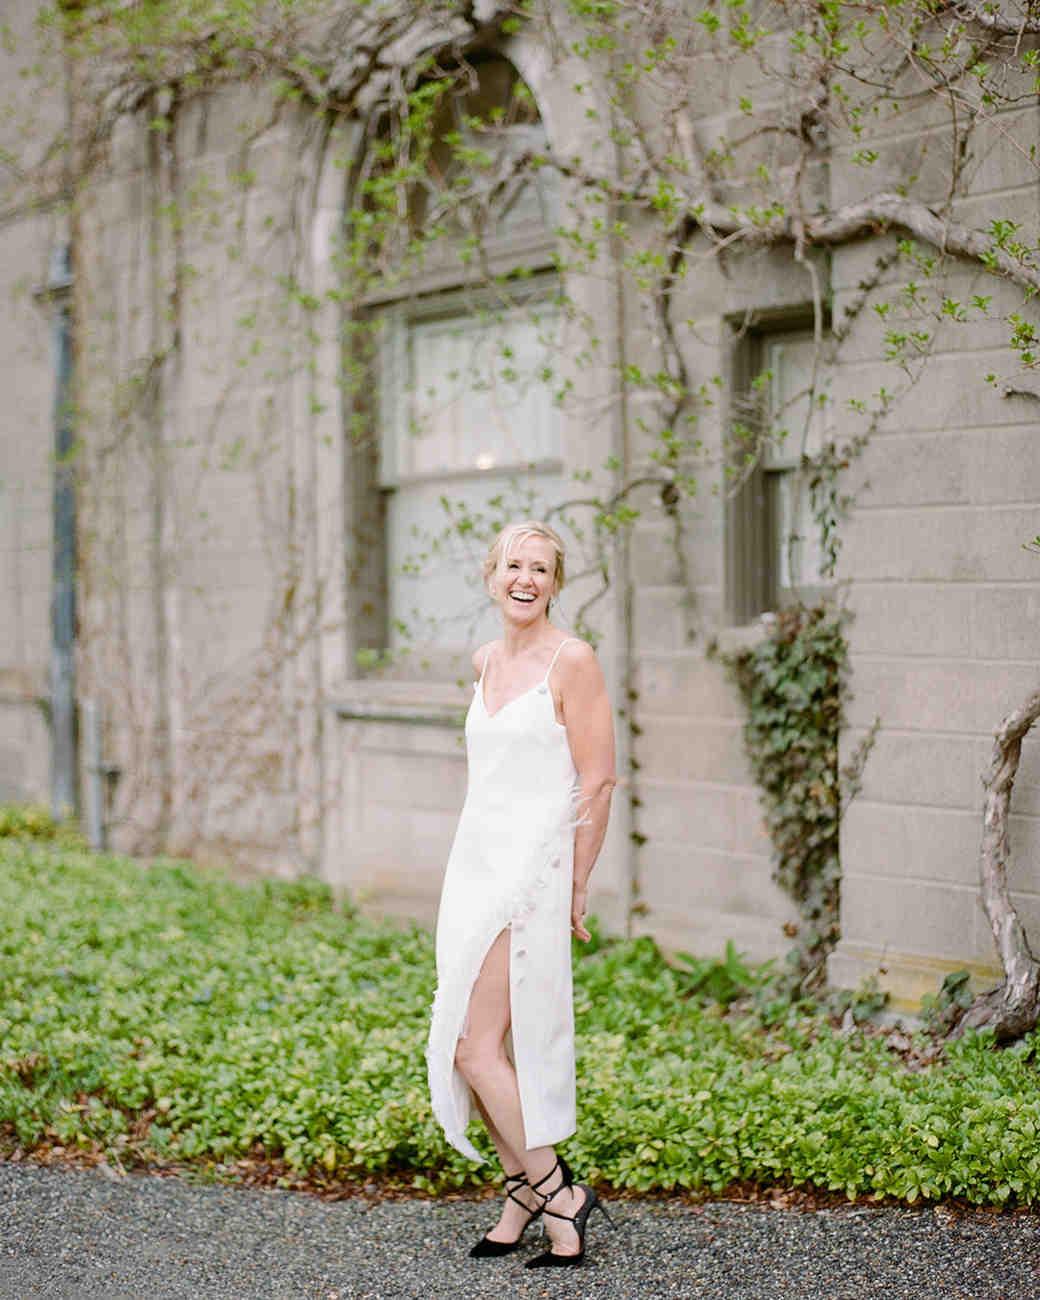 a9fc0d06981 wedding reception dresses spaghetti strap tea length dress with slit